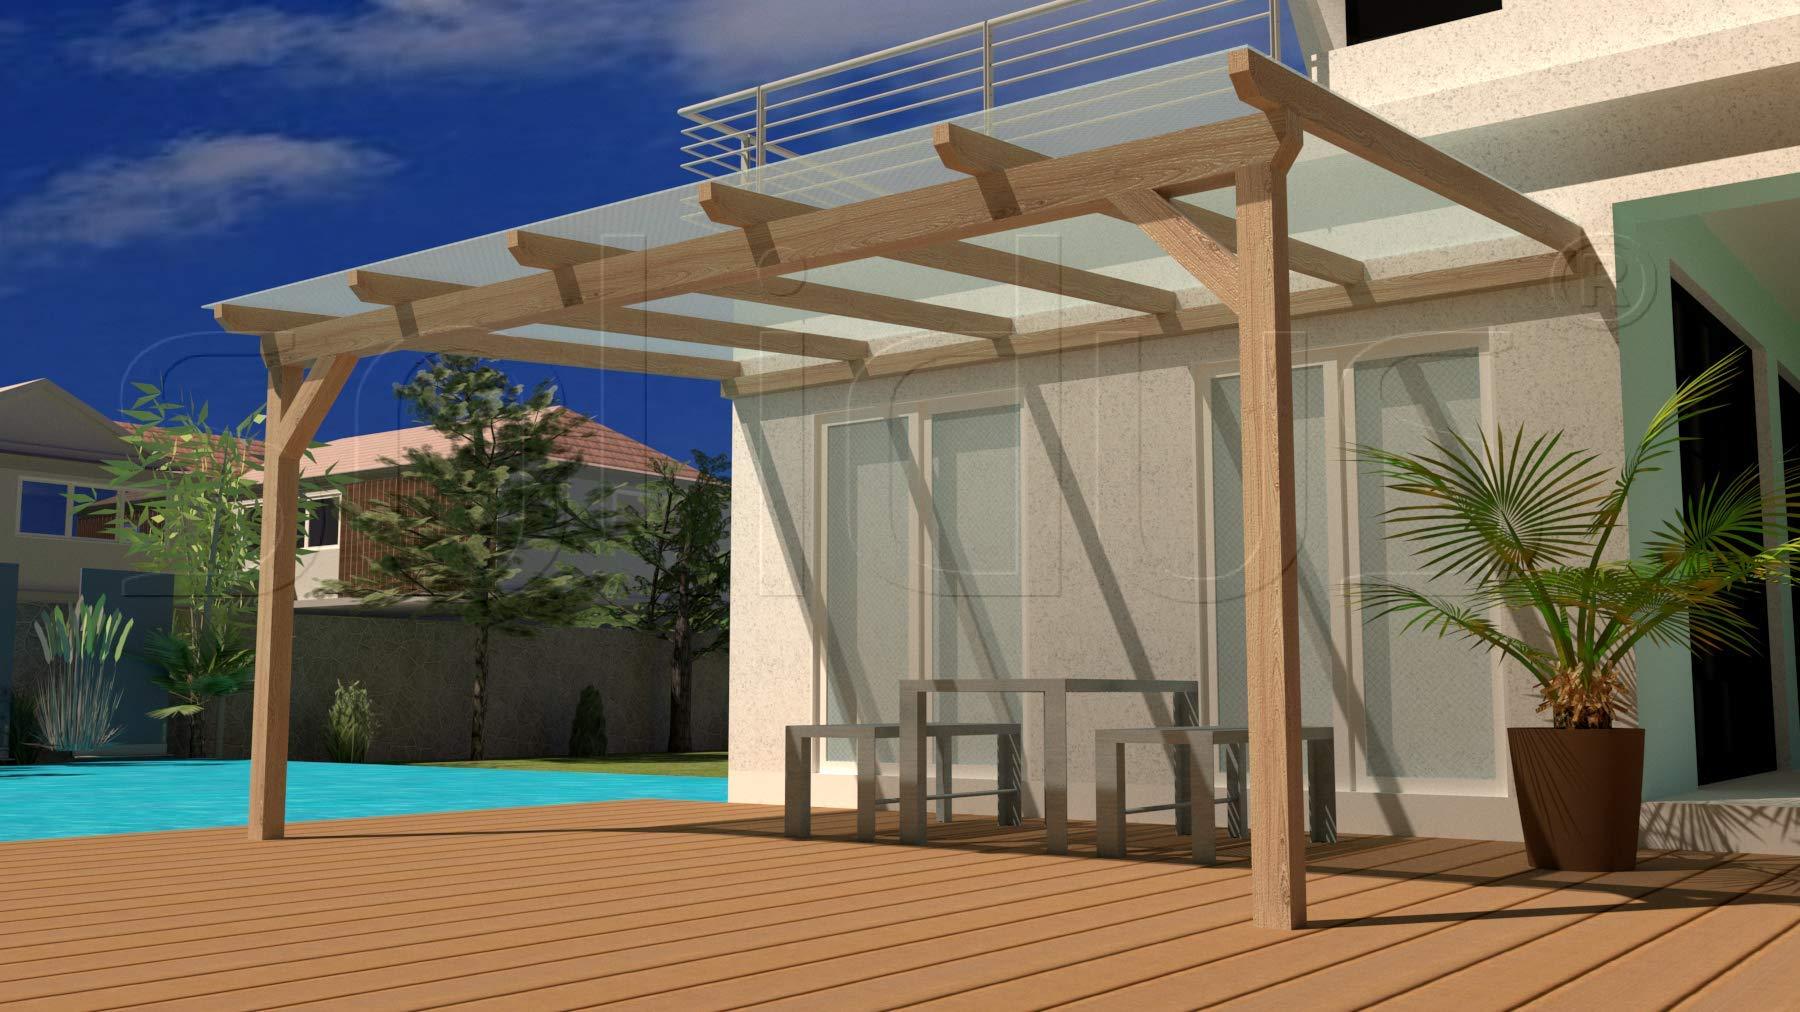 Hap PREMIUM 300 x 350 cm organizador de madera terrazas toldo + plancha + accesorios - sin